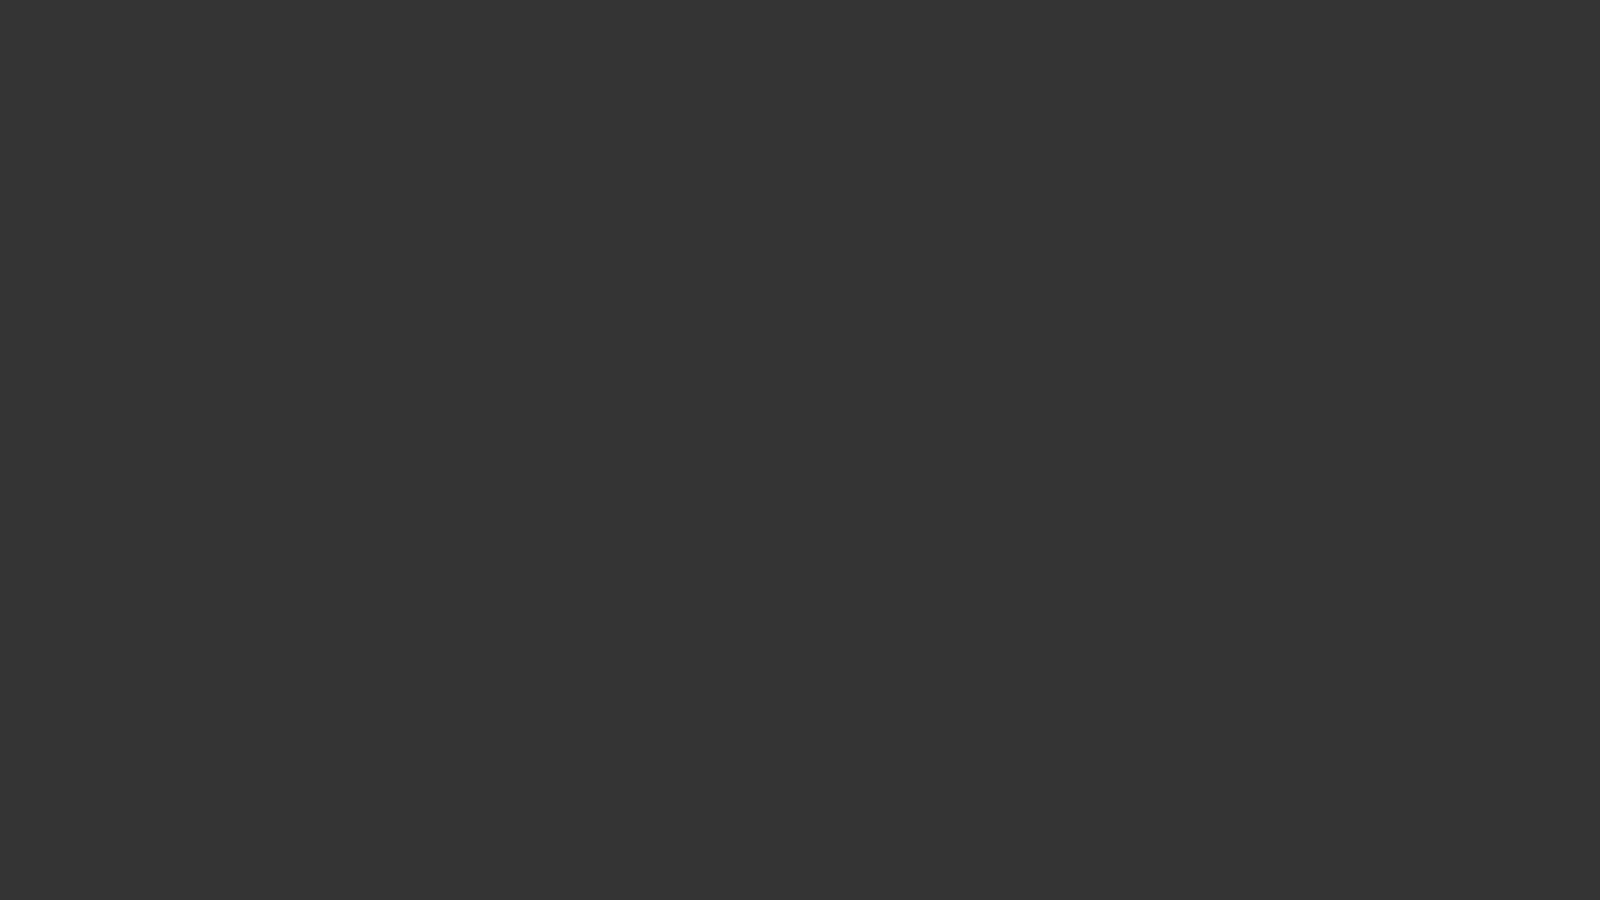 1600x900 Jet Solid Color Background